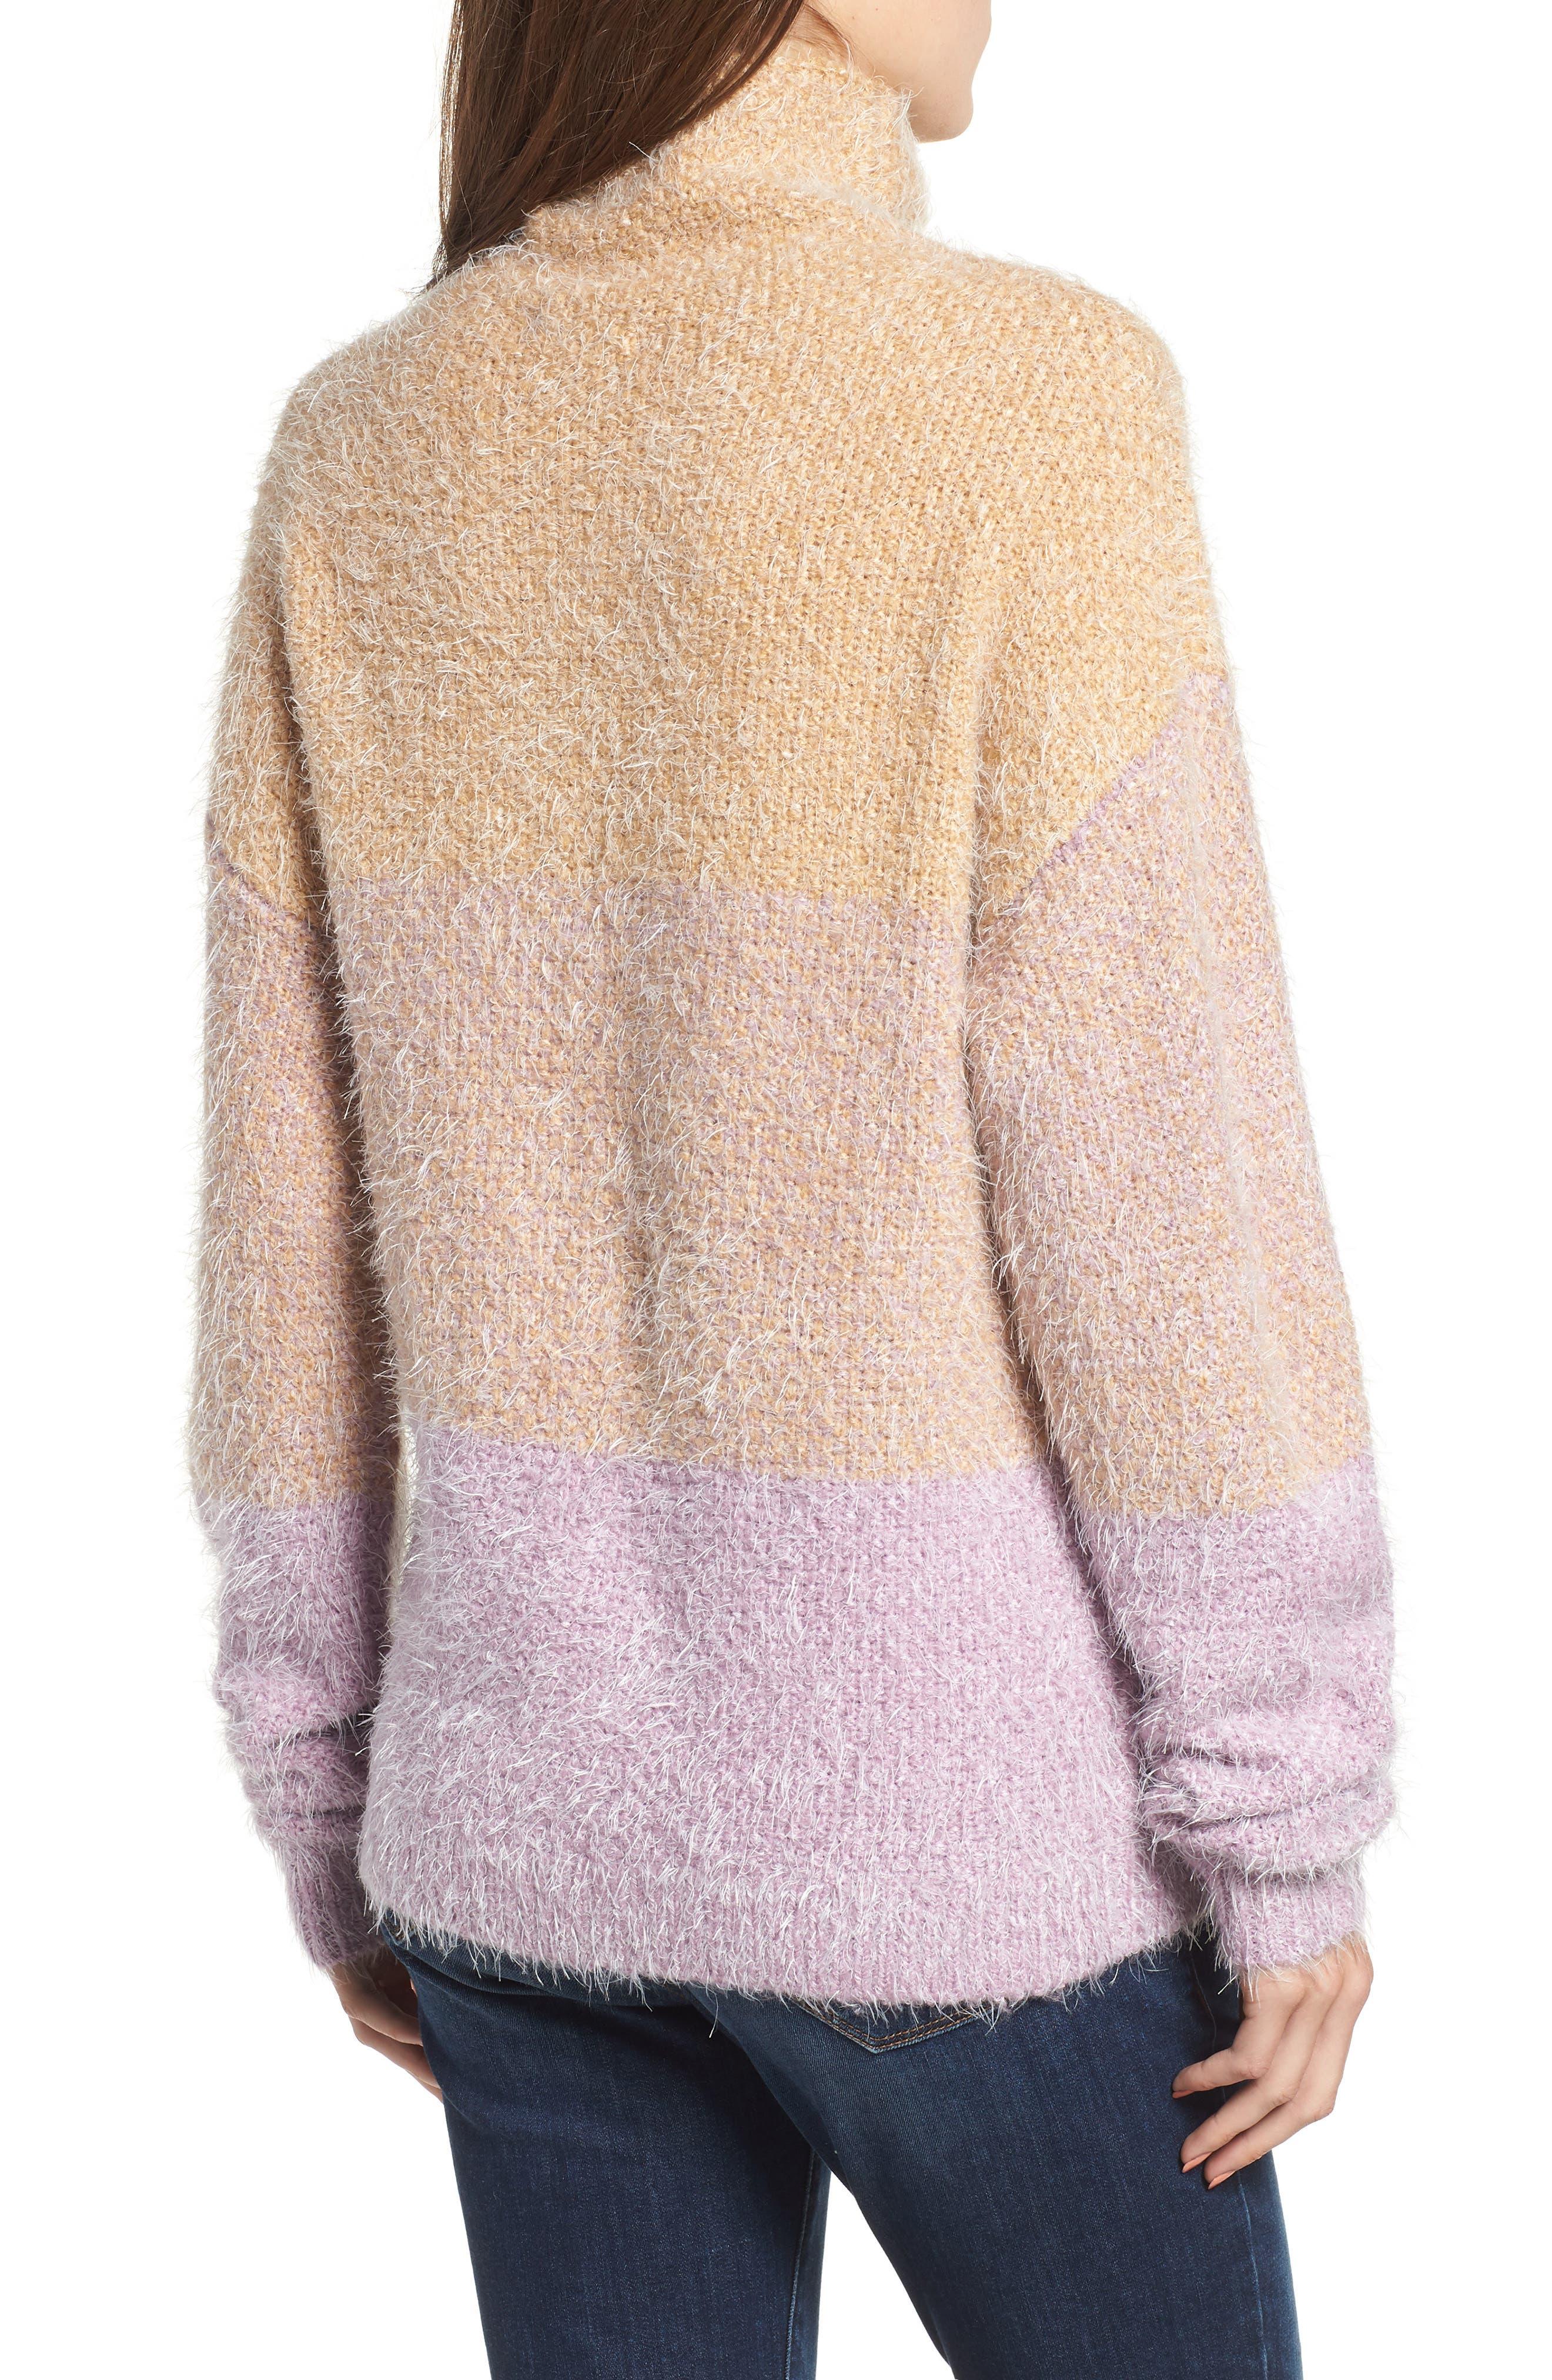 Ombré Eyelash Sweater,                             Alternate thumbnail 2, color,                             680